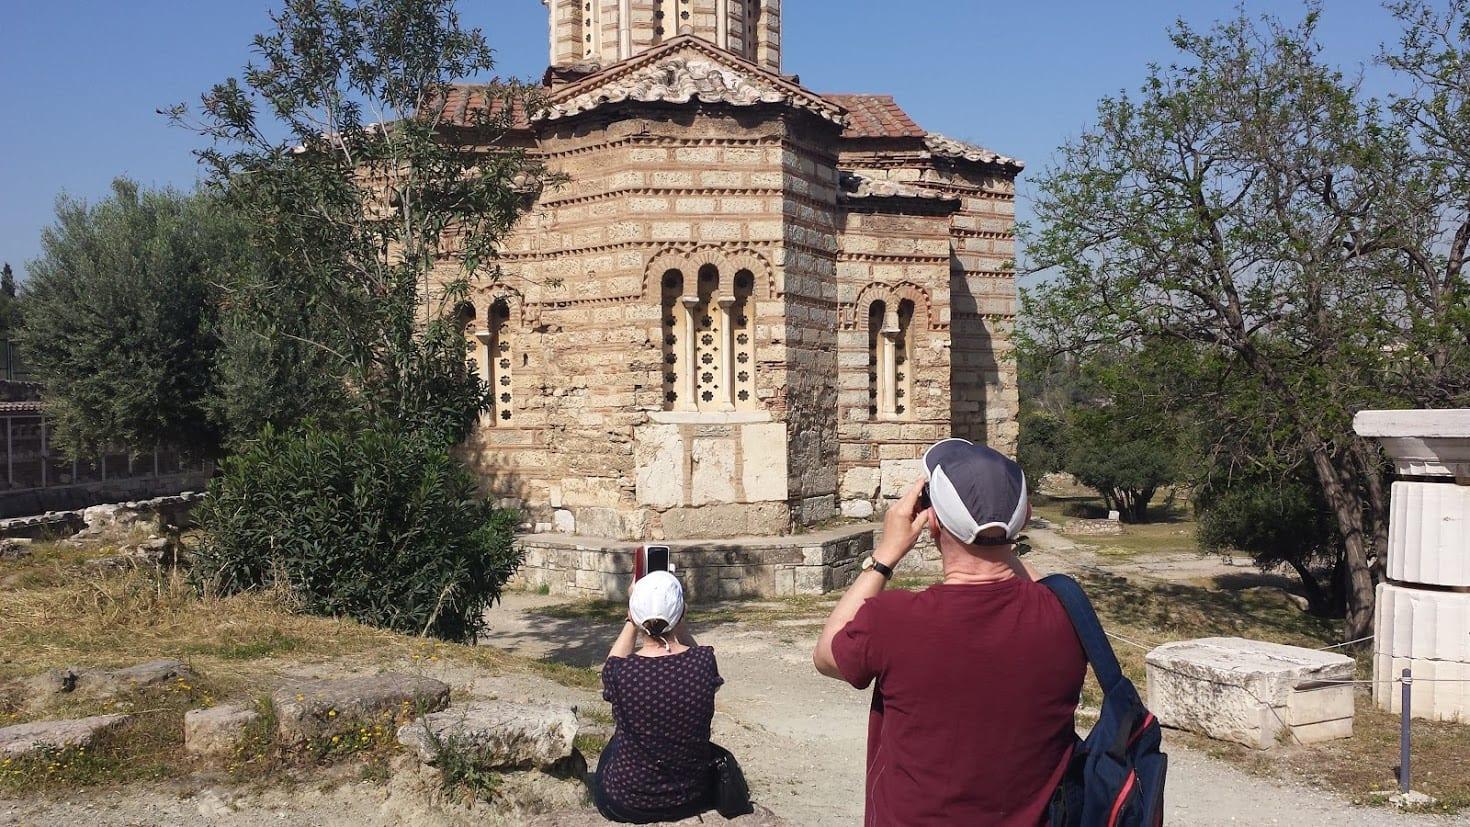 Church of the APostles in the Agora Athens